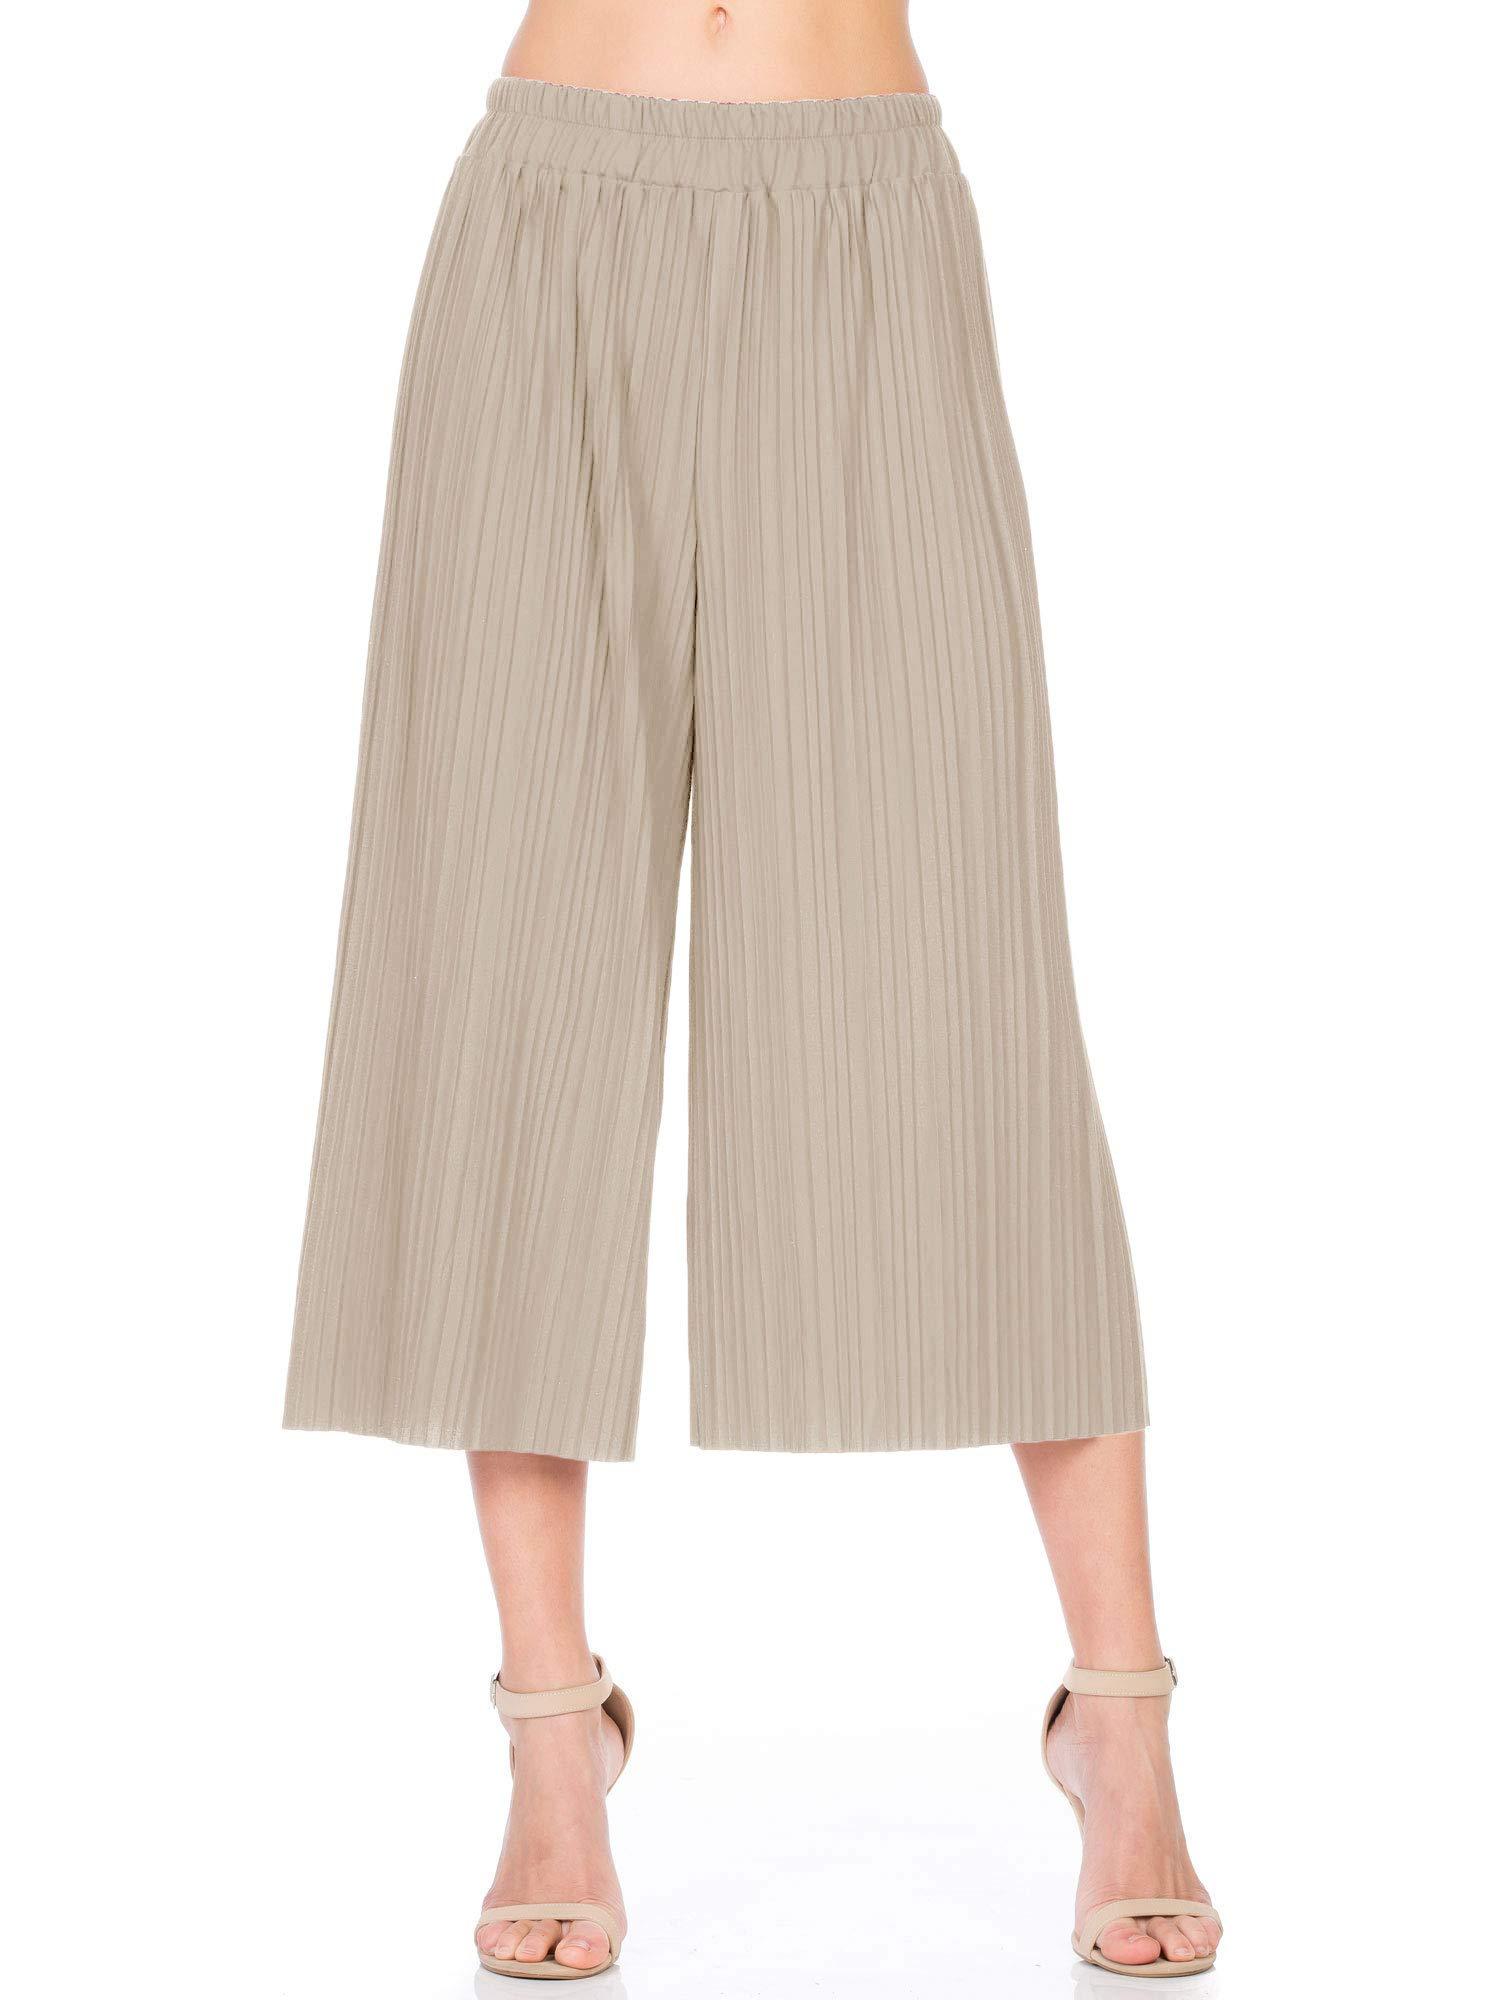 Fashion California Womens Elastic Waist Accordion Pleated Wide Culottes Capri Pants (L/XL, Stone)